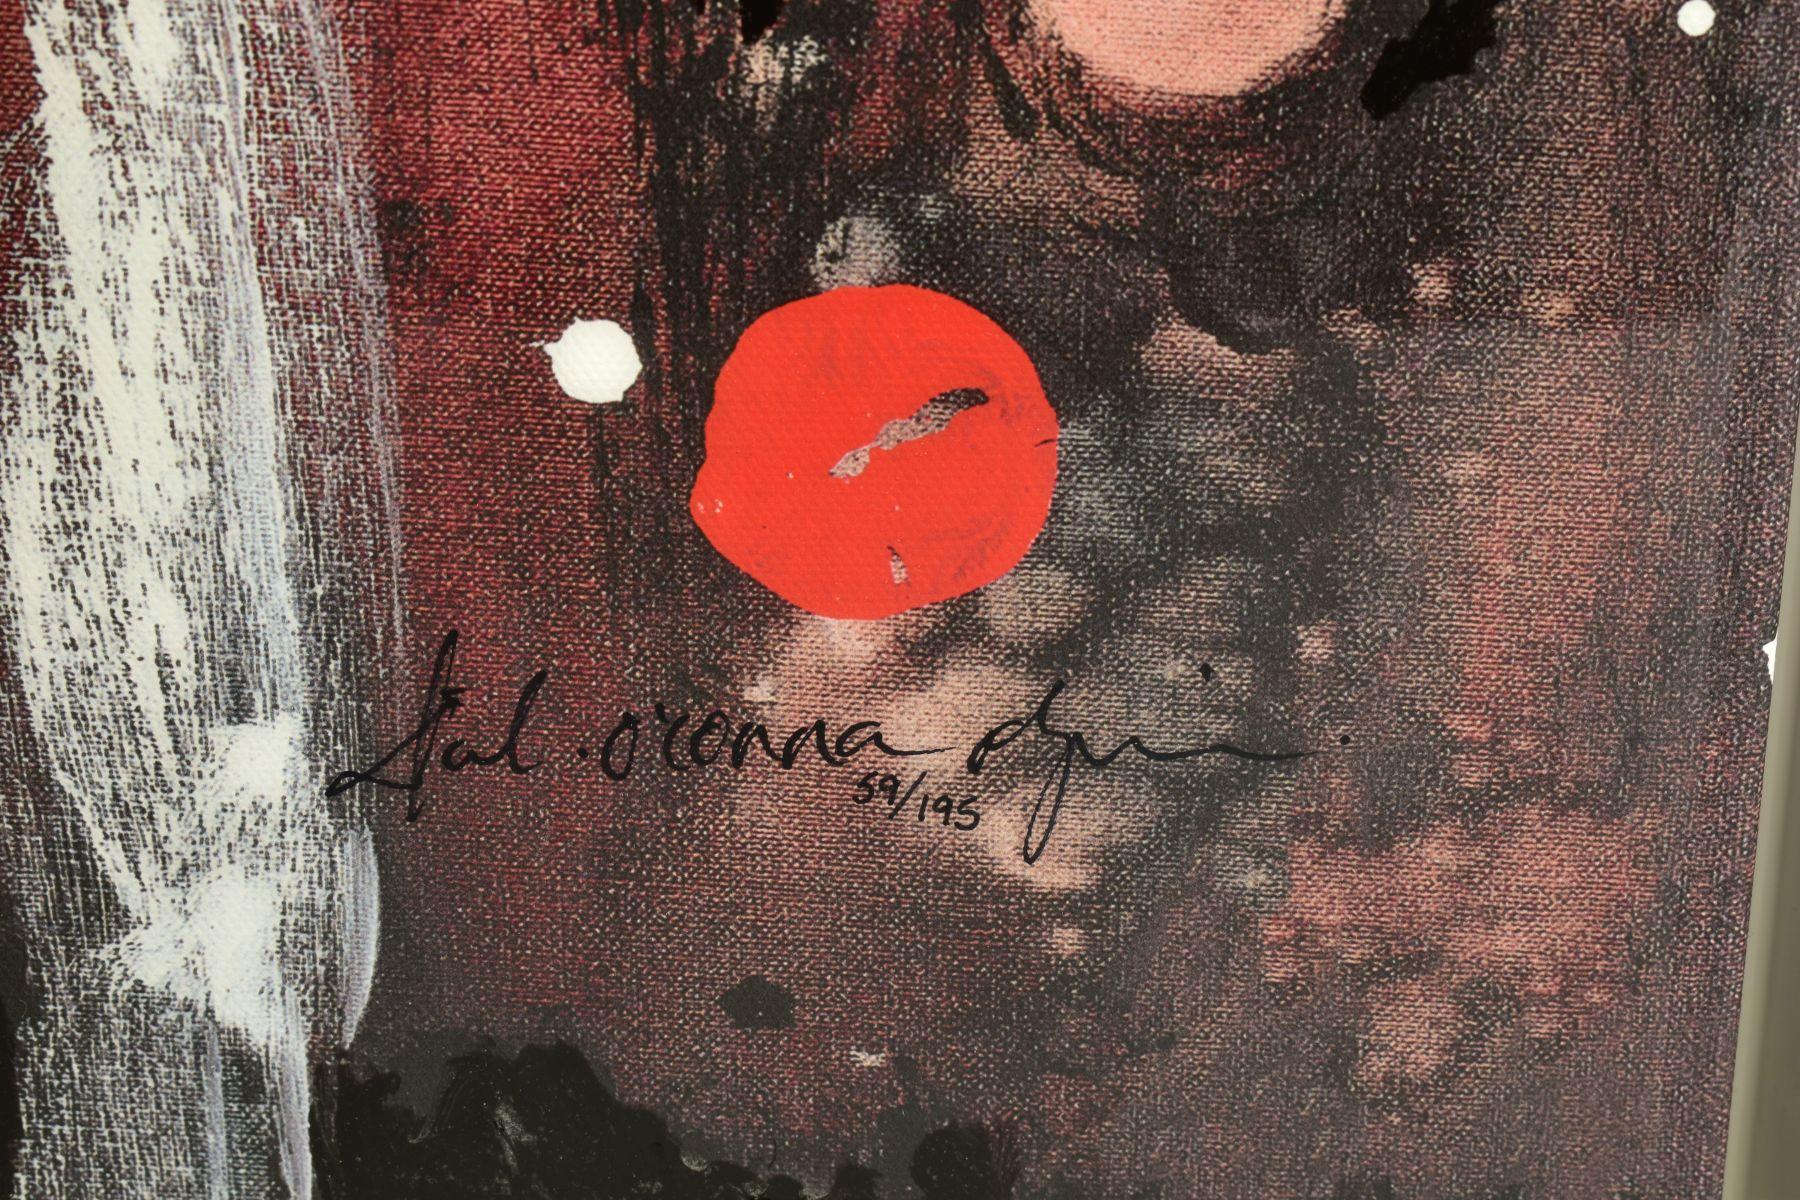 DANIELLE O'CONNOR AKIYAMA (CANADA 1957), 'Painted Dreams I', a Limited Edition print of a - Image 3 of 6